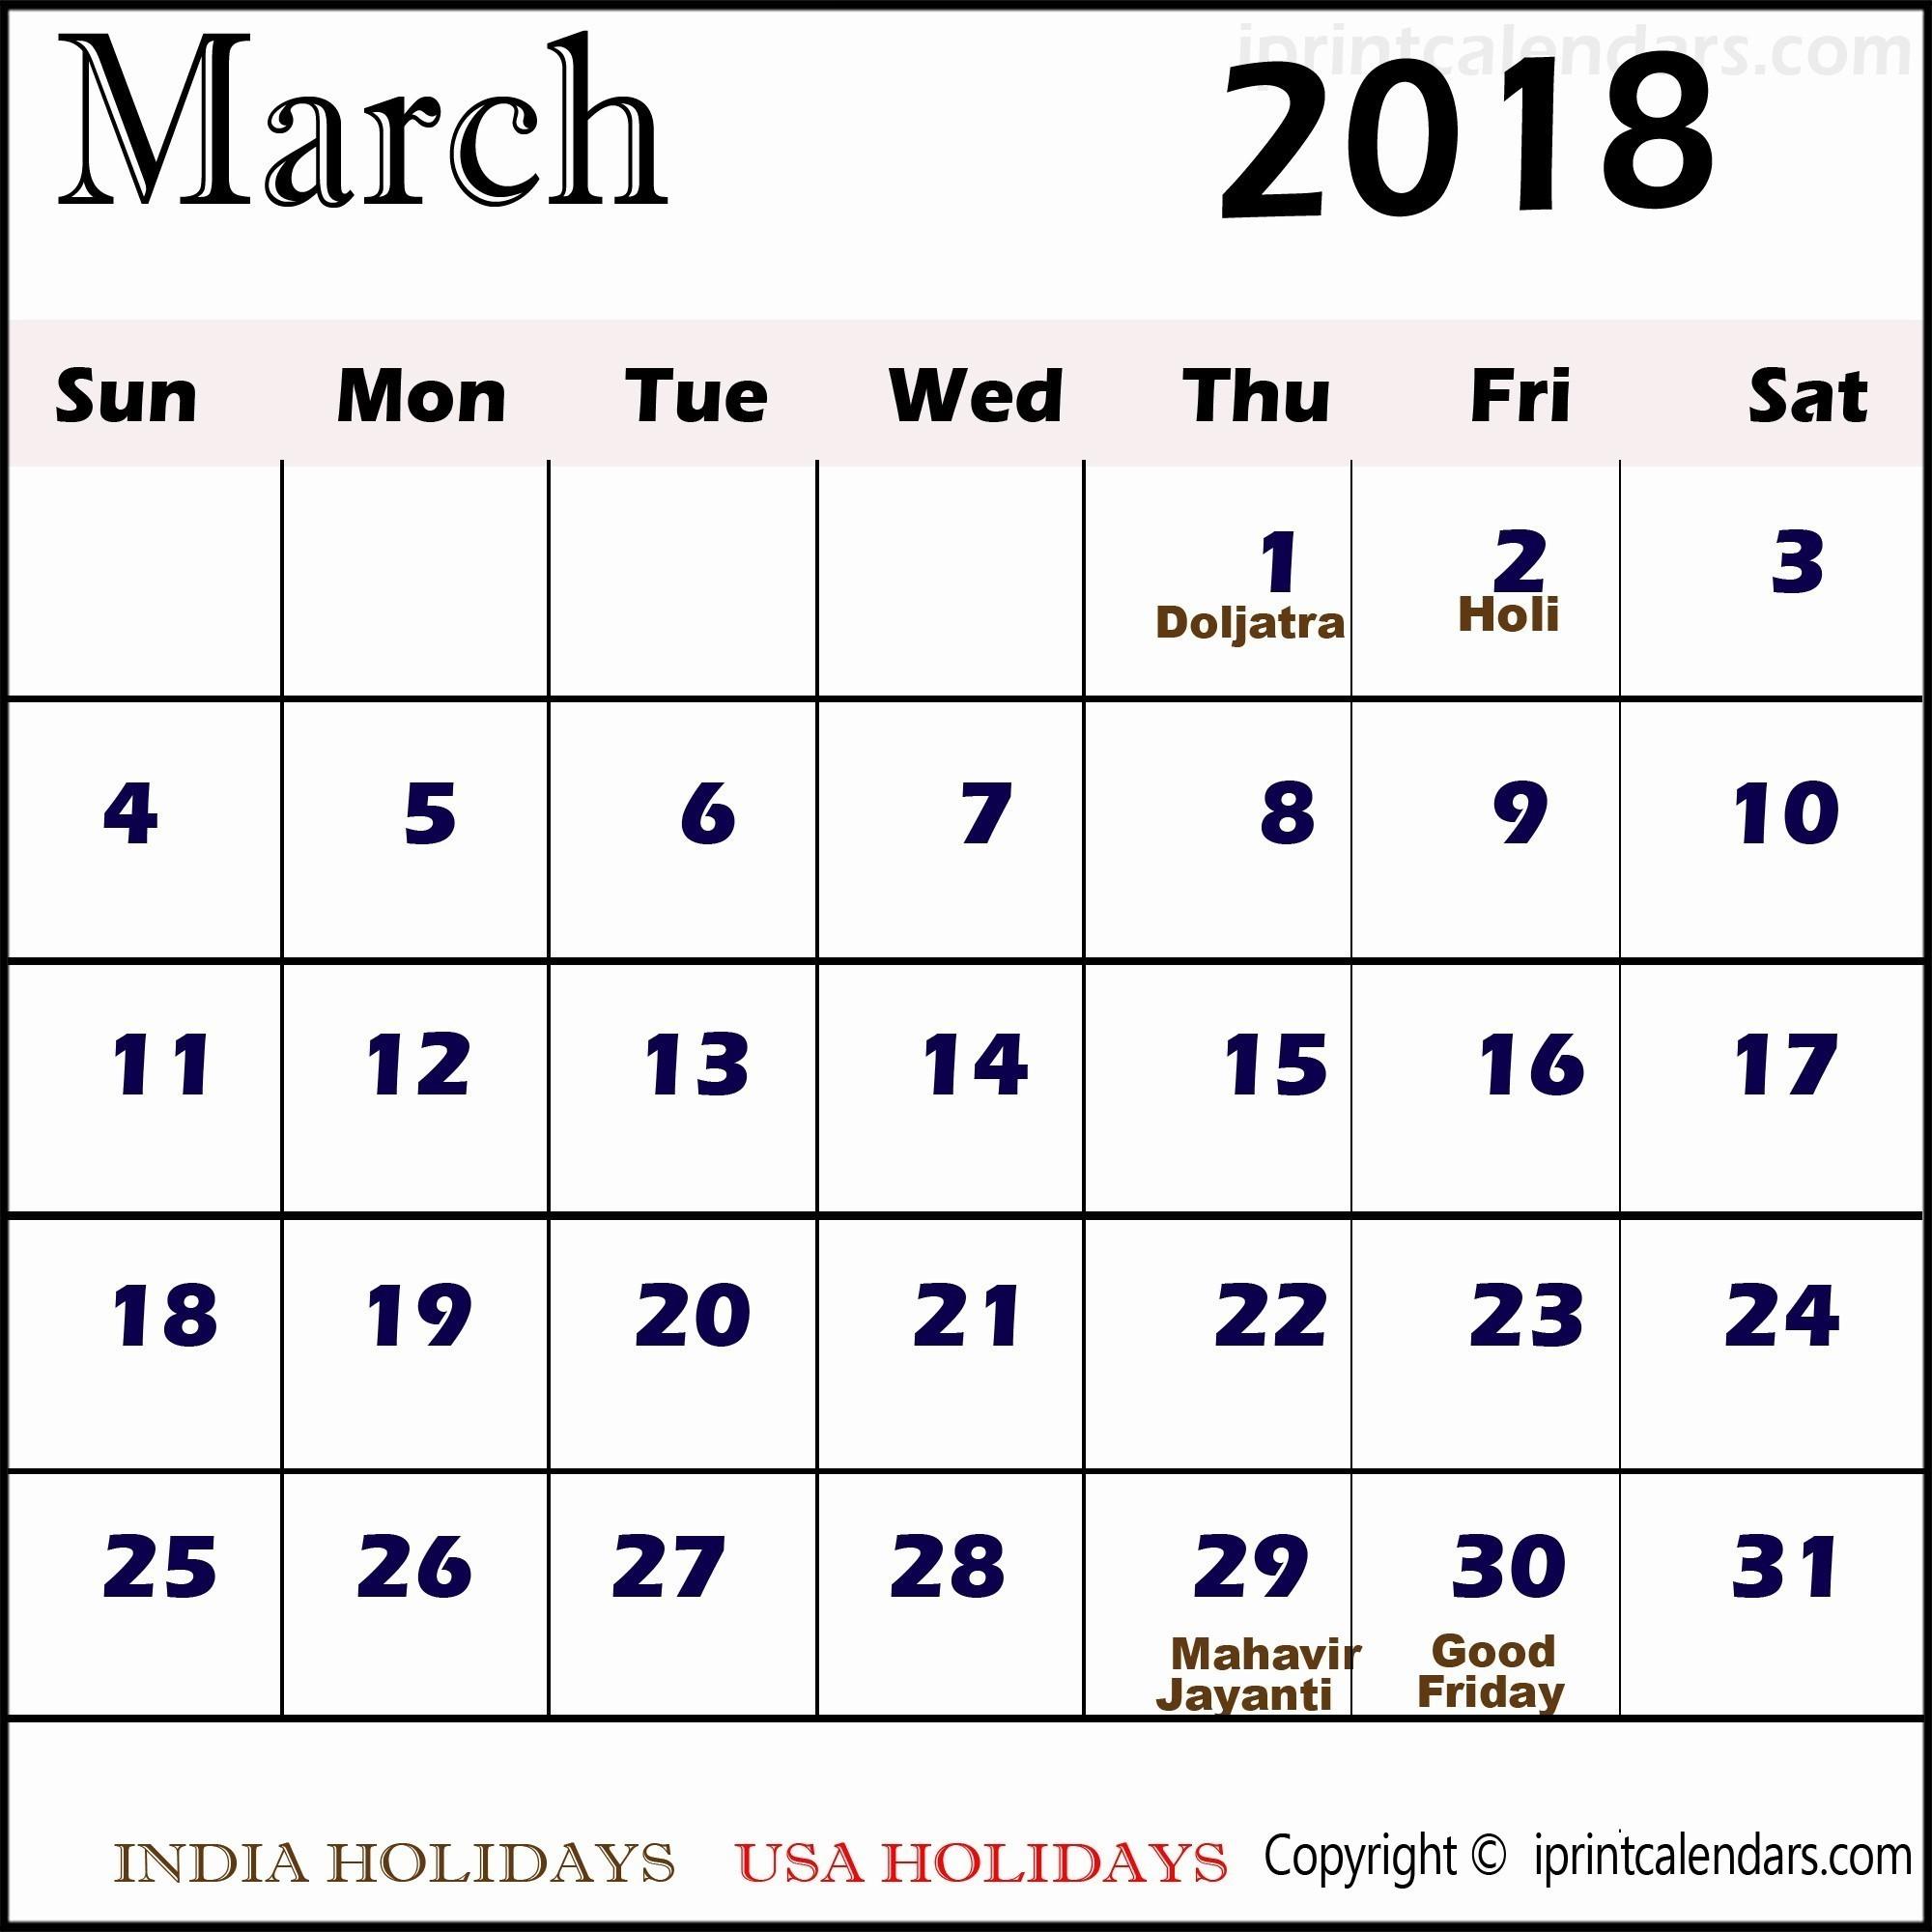 September 2019 Hindu Calendar 2019 Printable Yearly Calendar with